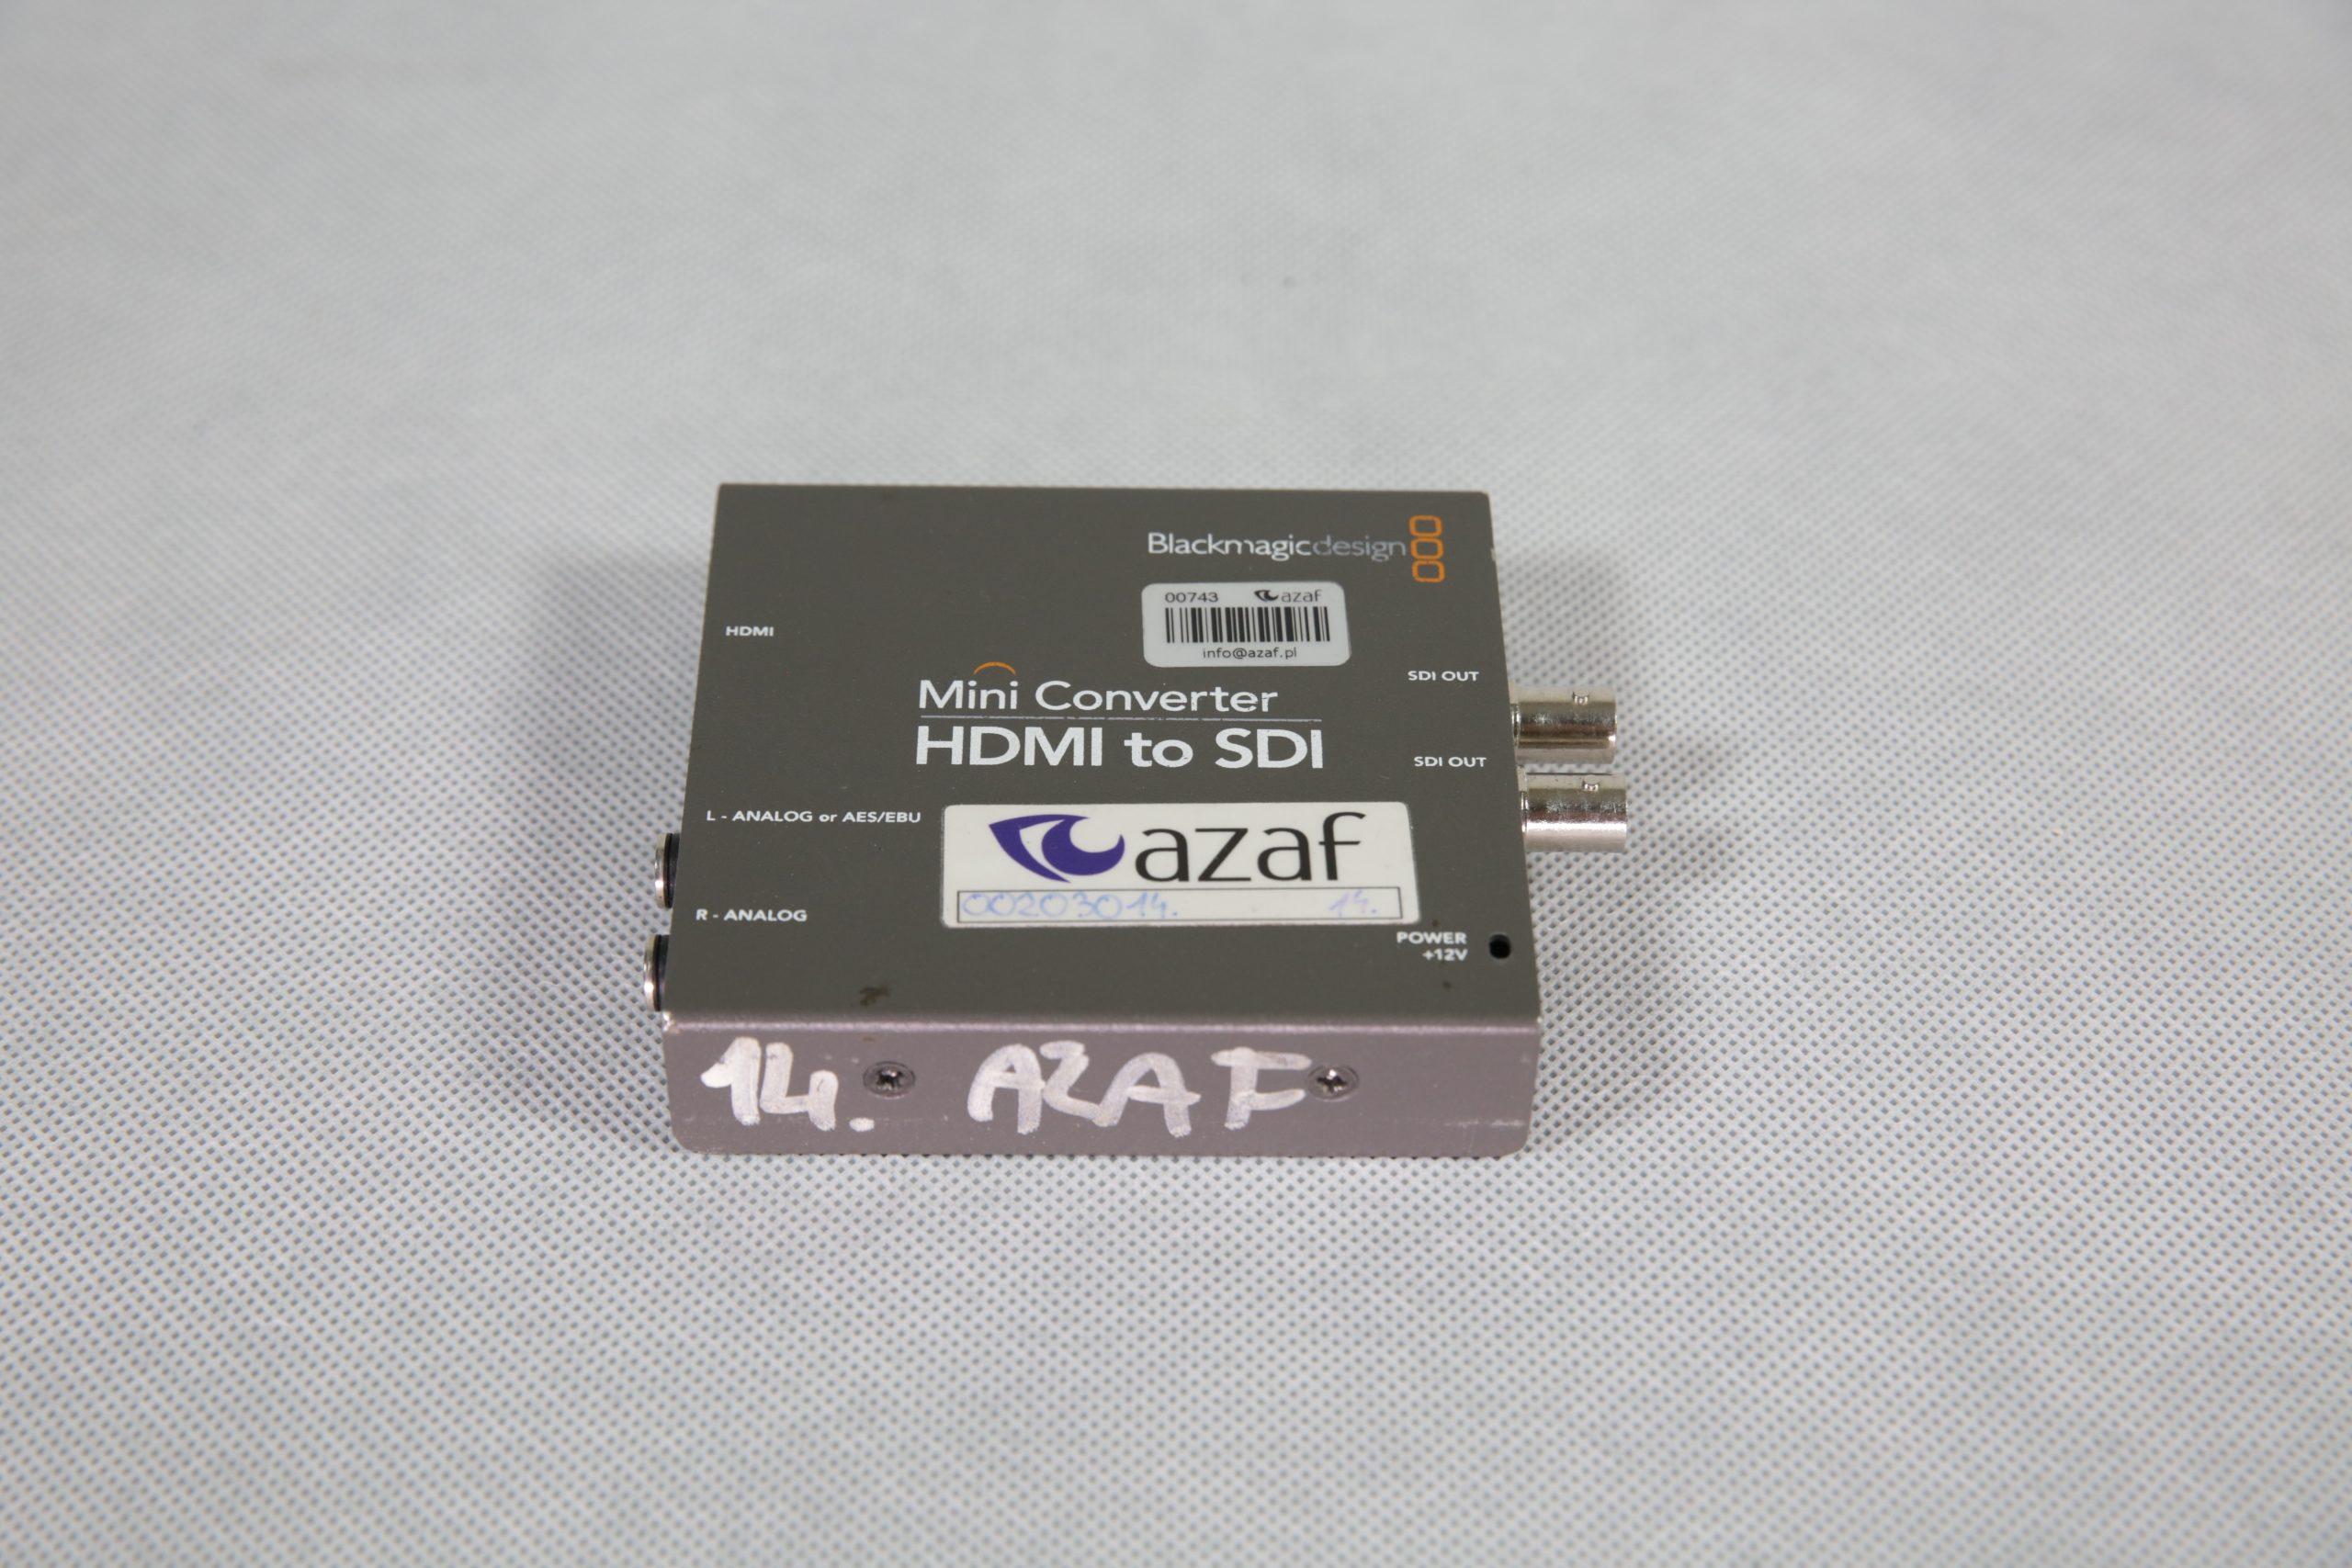 Black Magic HDMI to SDI